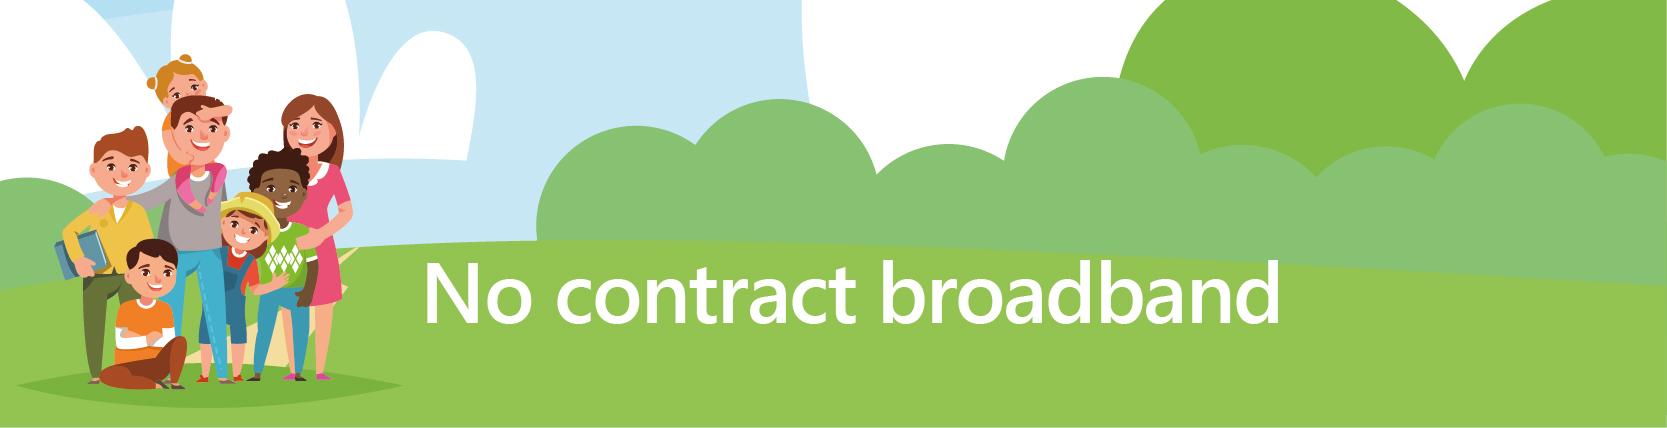 no contract broadband